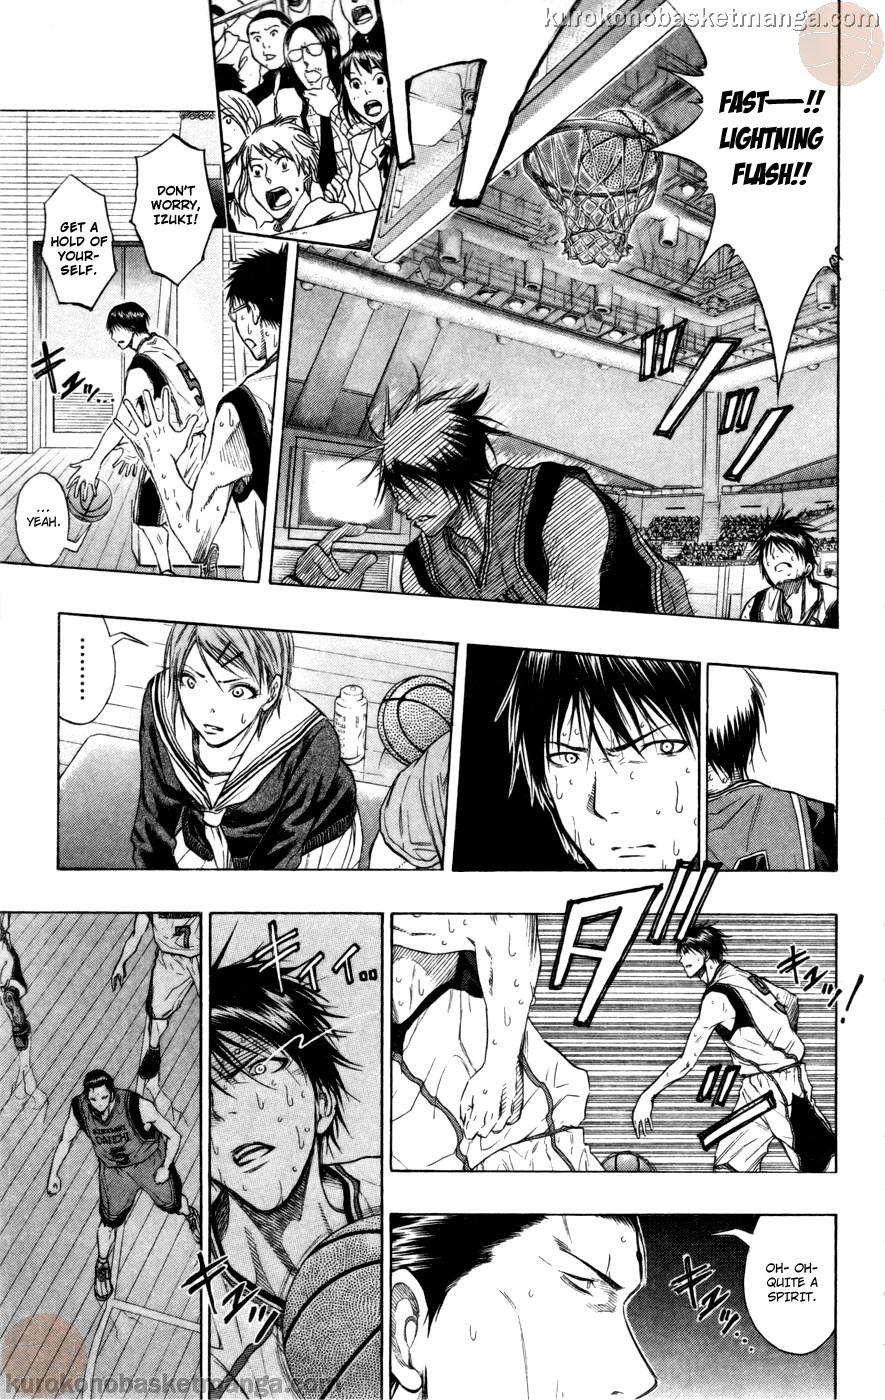 Kuroko no Basket Manga Chapter 104 - Image 09